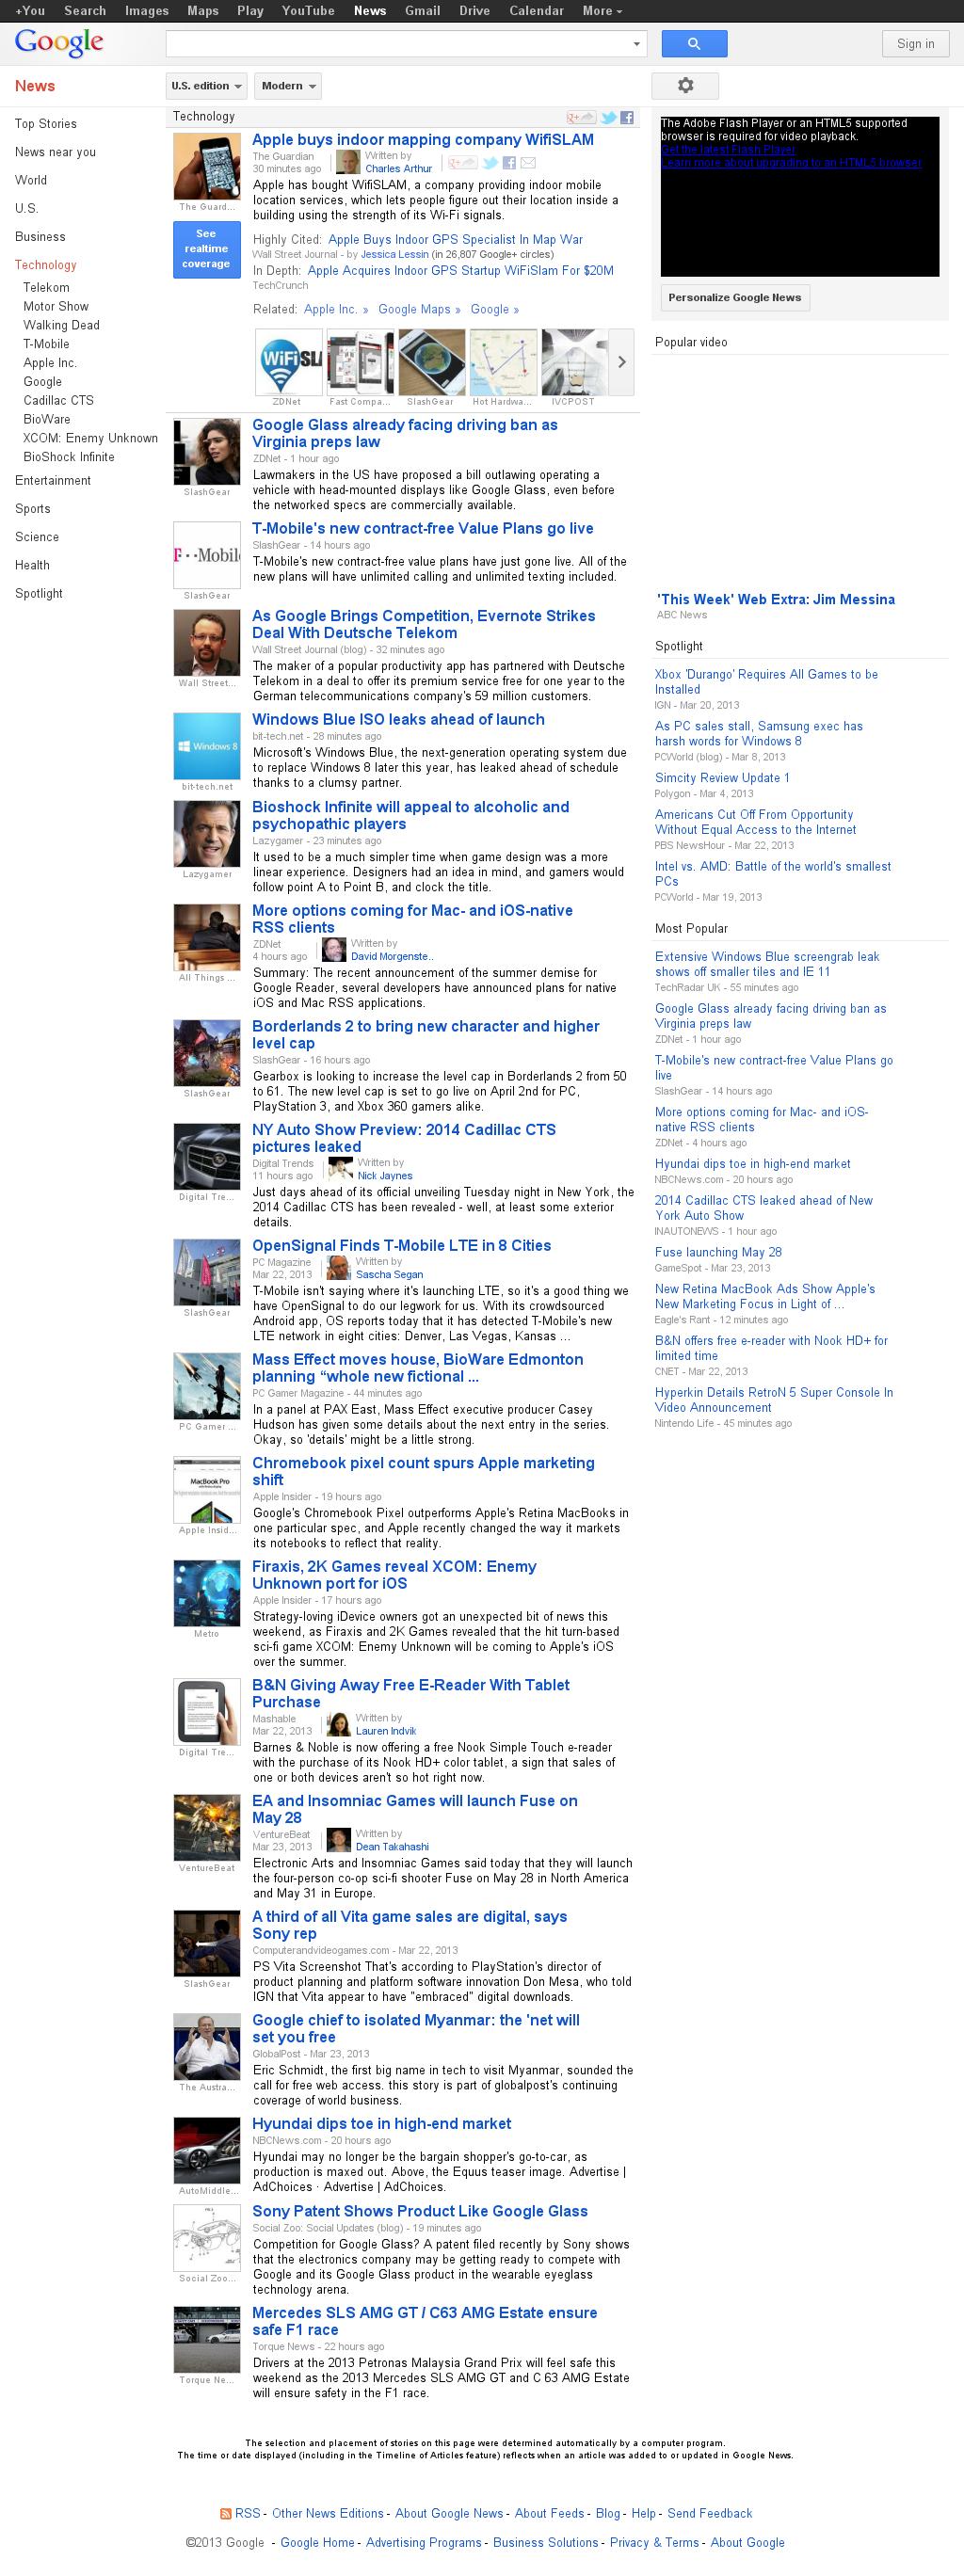 Google News: Technology at Monday March 25, 2013, 11:16 a.m. UTC